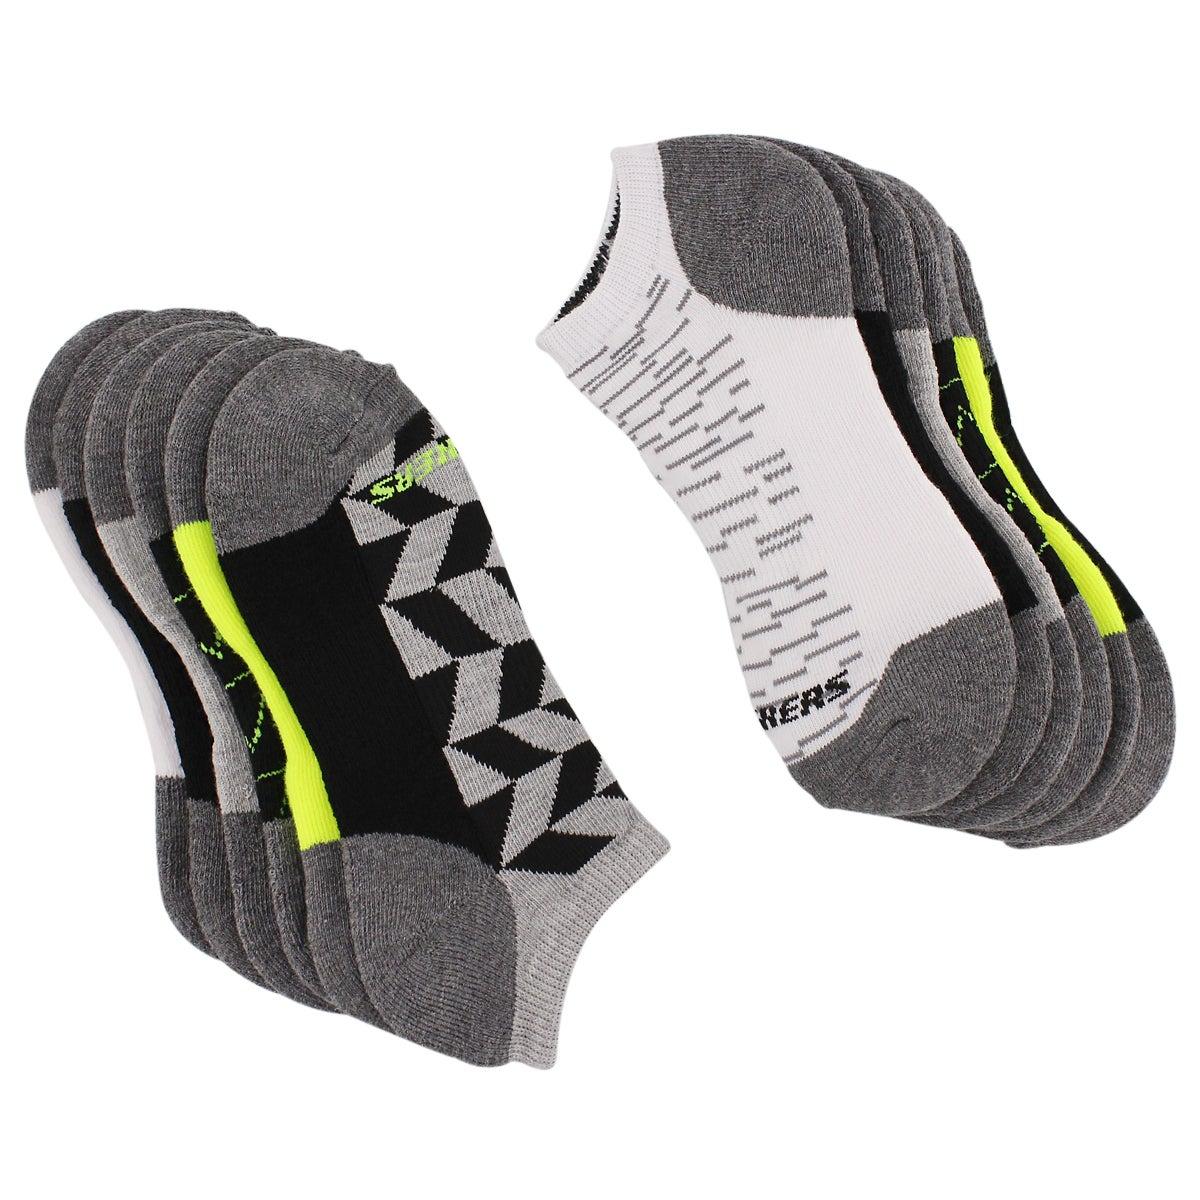 Bys 1/2 Terry Sport wht/gry 6pk low sock